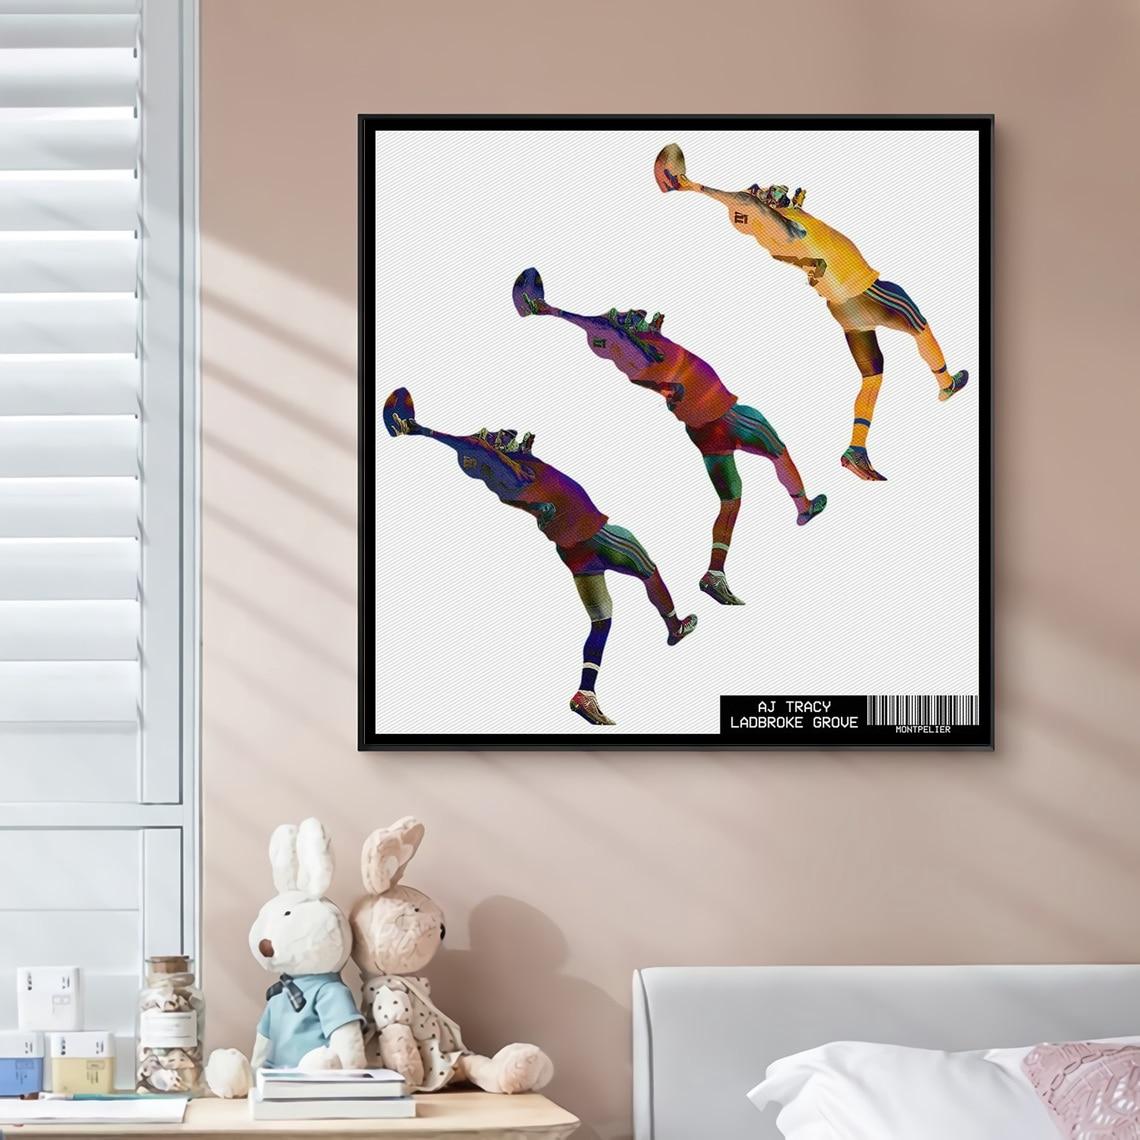 AJ Tracy Ladbroke Grove Music Album Cover Canvas Poster Rap Star Pop Singer Wall Painting Art Decoration (No Frame)